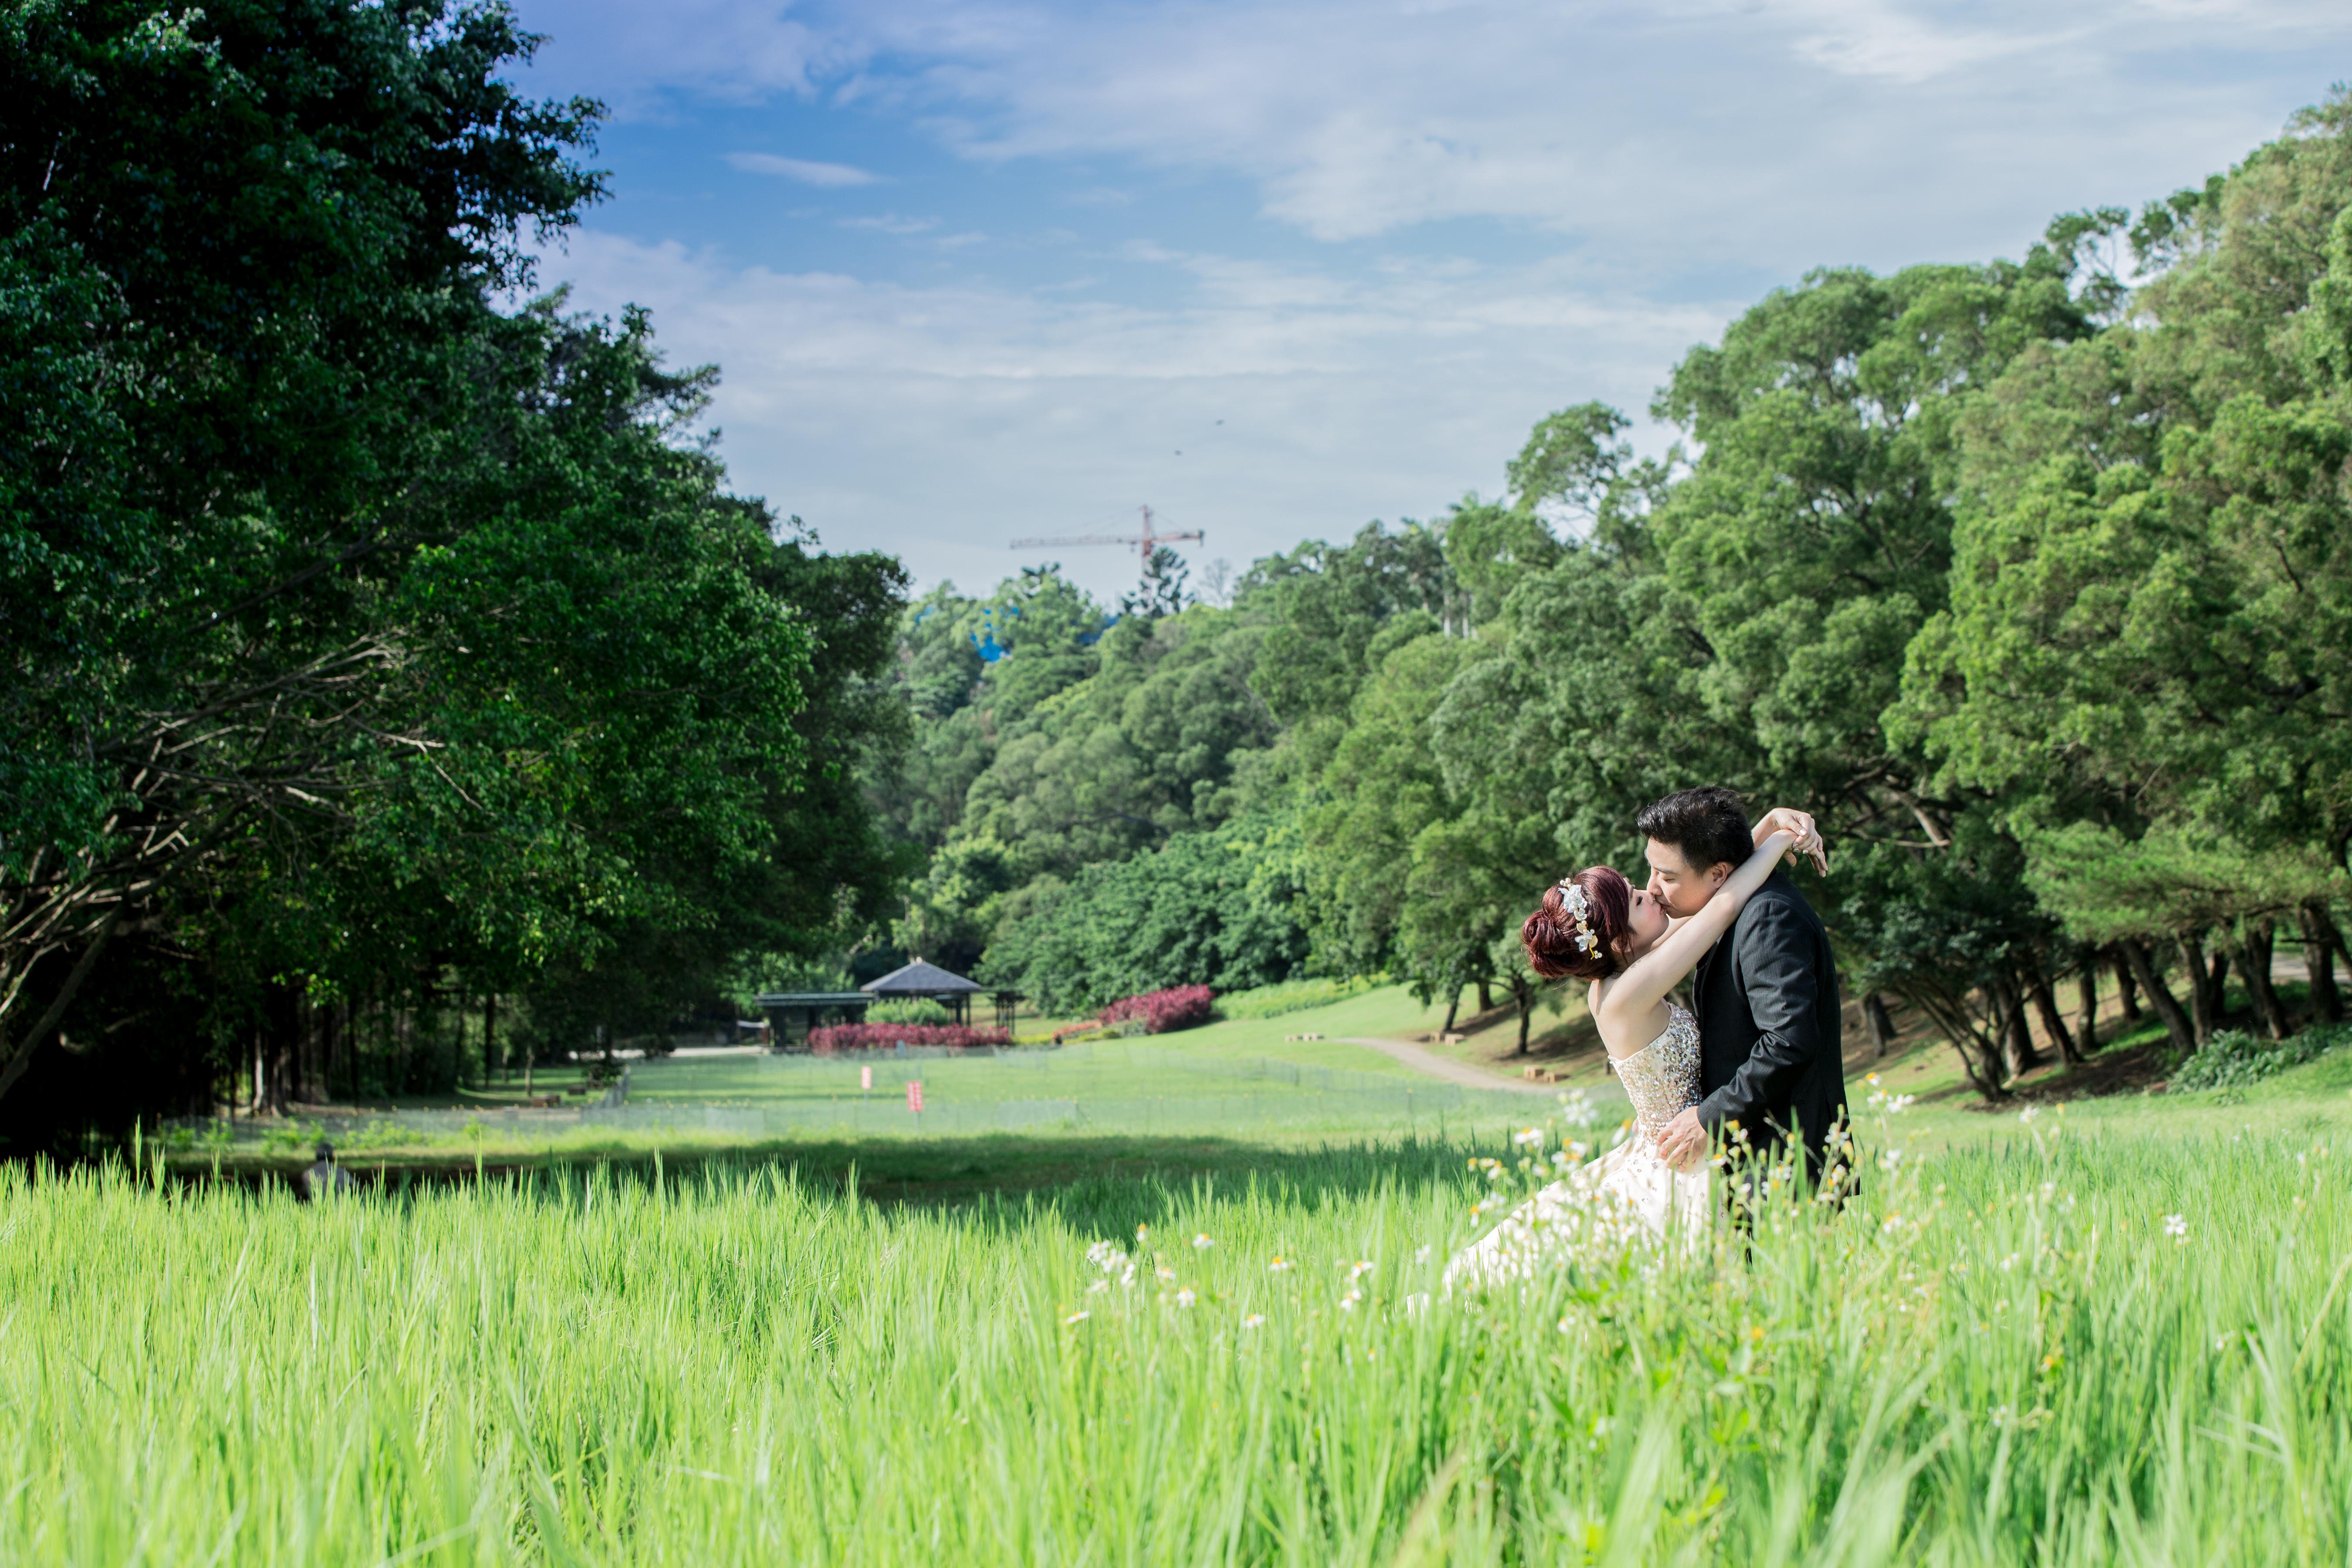 自助婚纱摄影